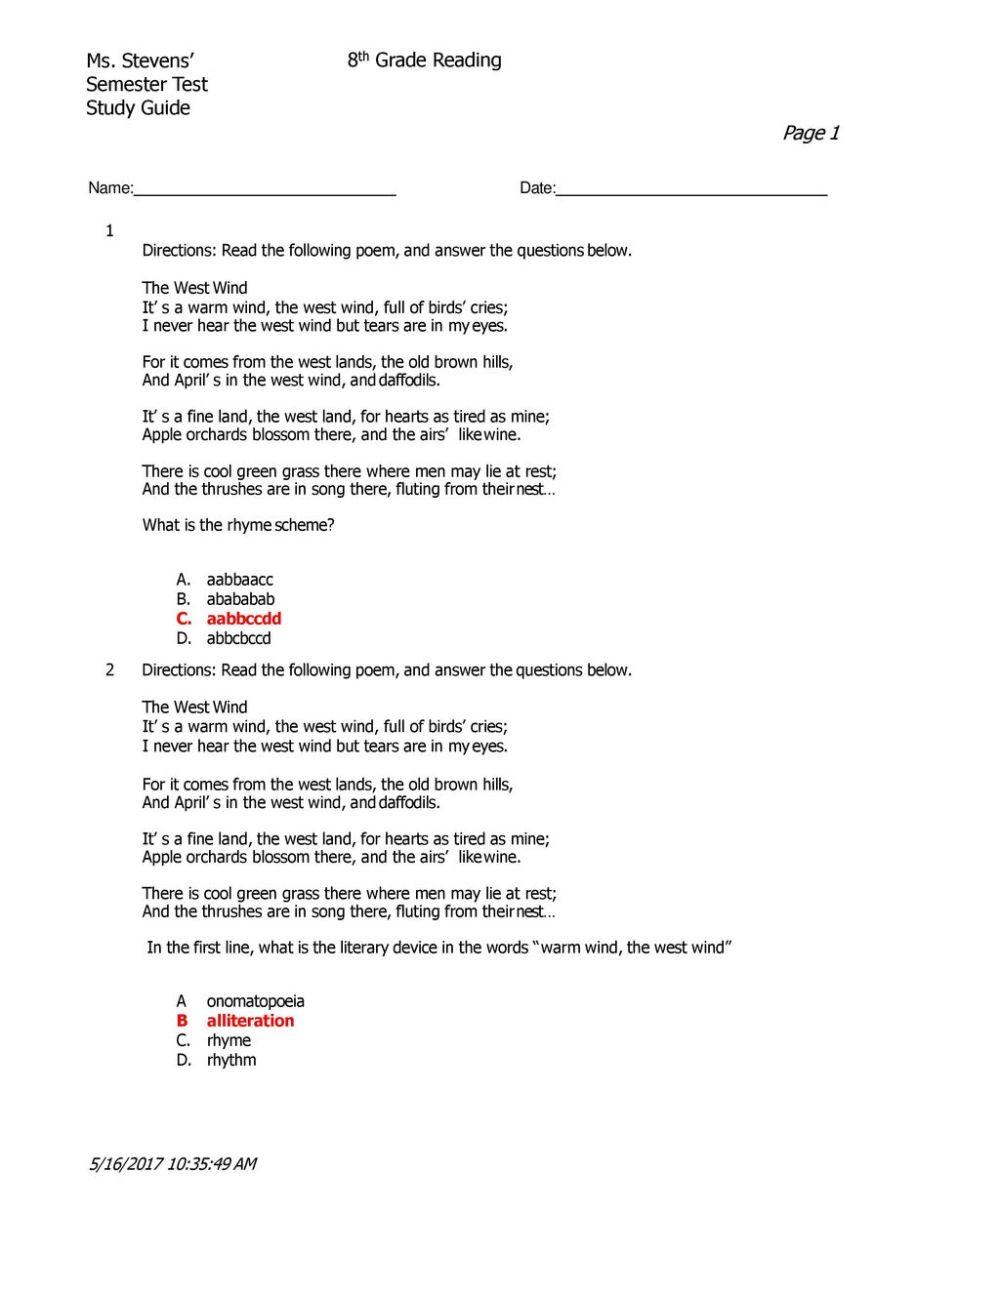 medium resolution of Ms. Stevens' Semester Test Study Guide 8th Grade Reading - ppt download